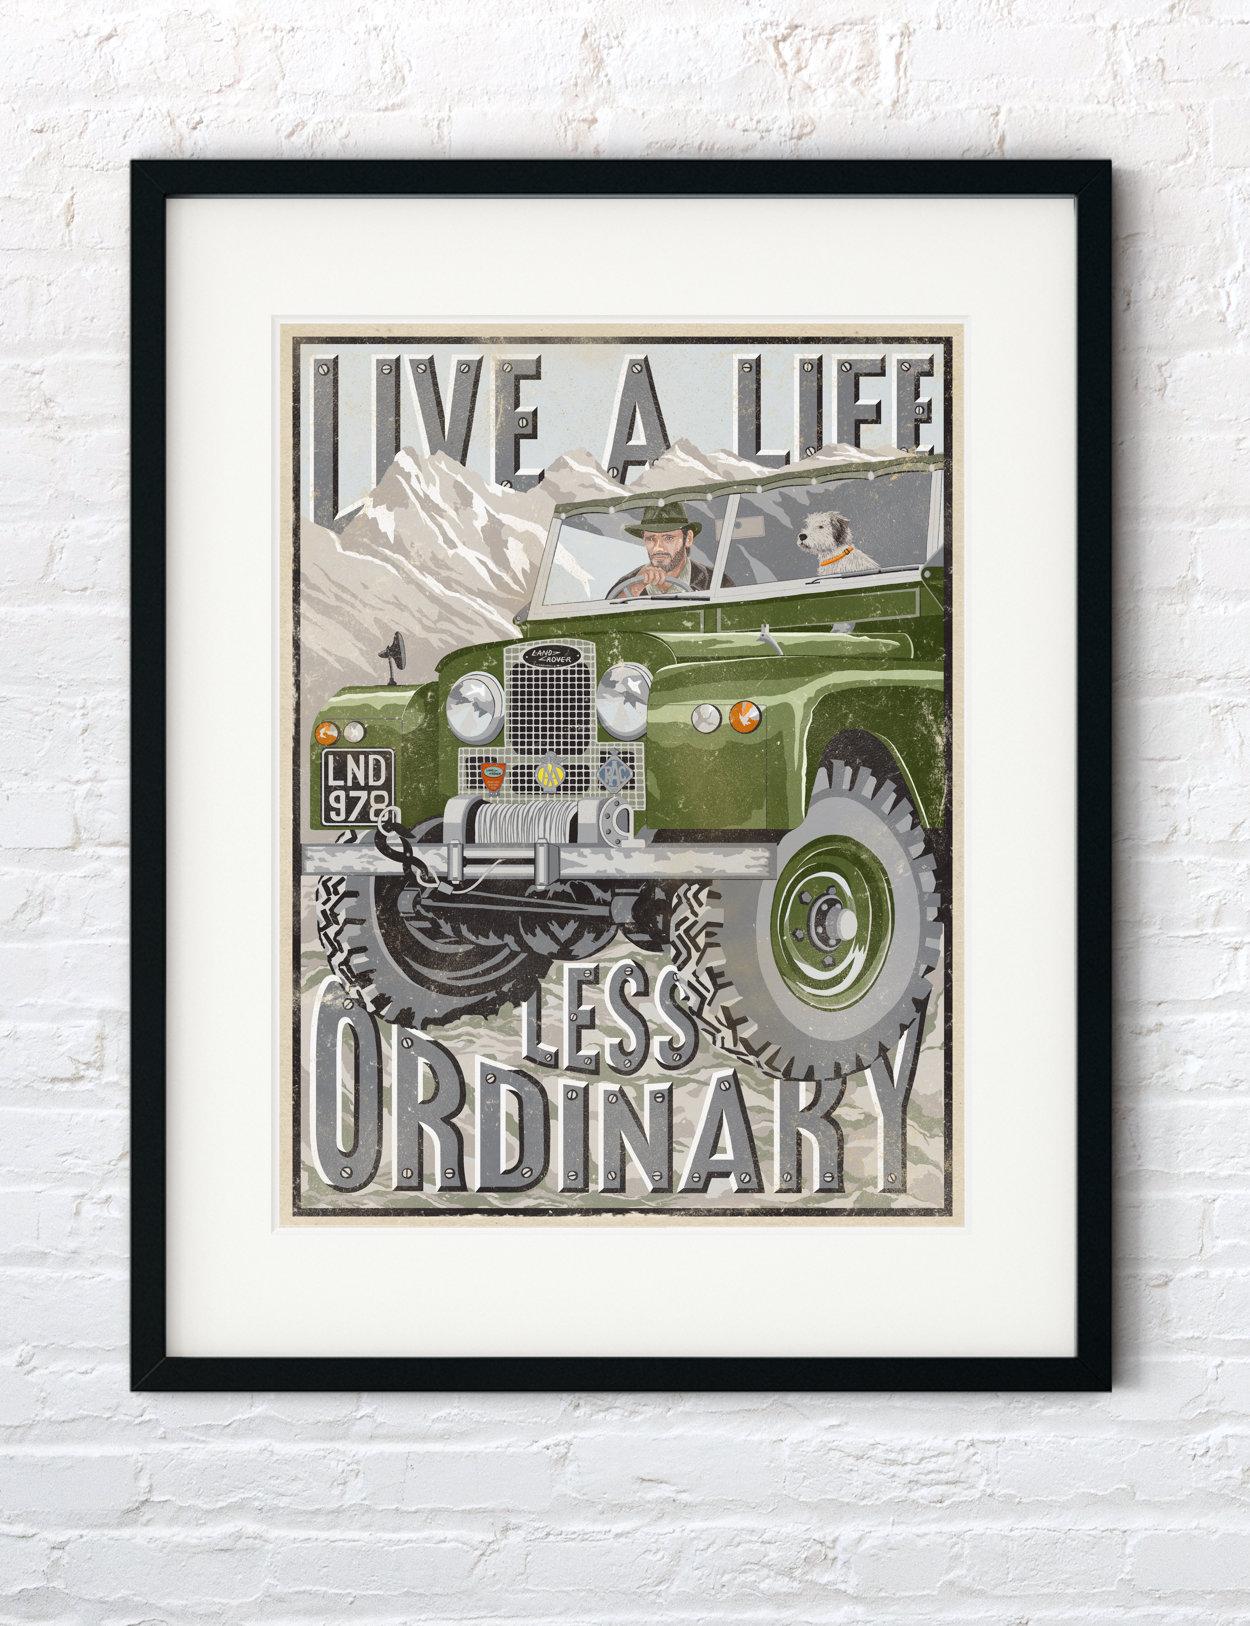 Land Rover Defender Series Vintage Print | The Enlightened Hound